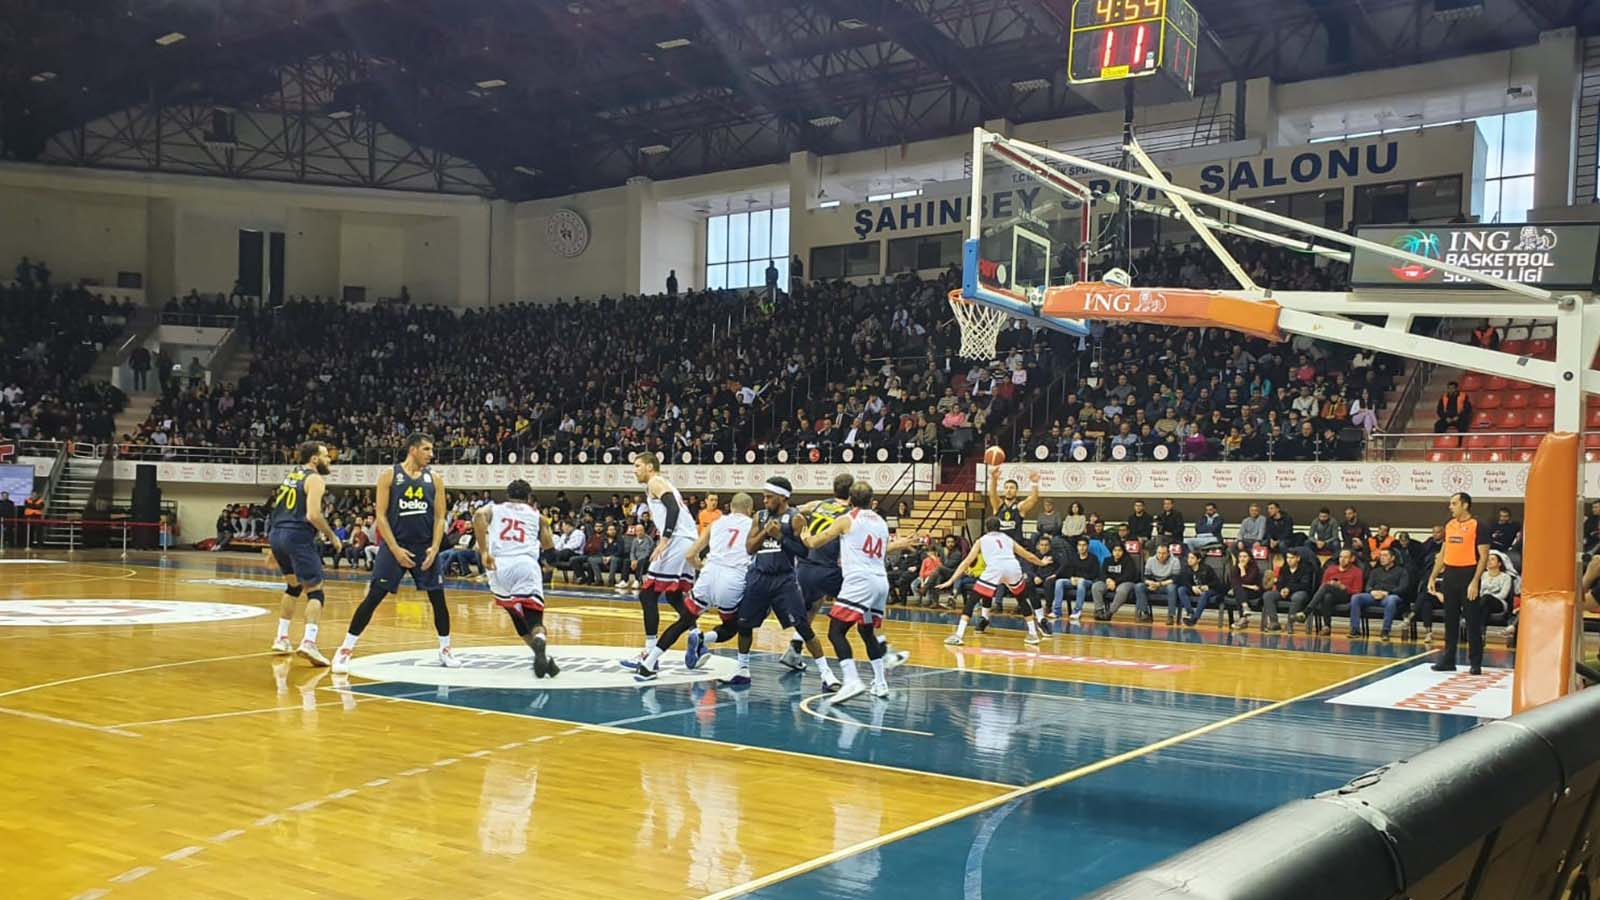 Gaziantep Basketbol 81-70 Fenerbahçe Beko